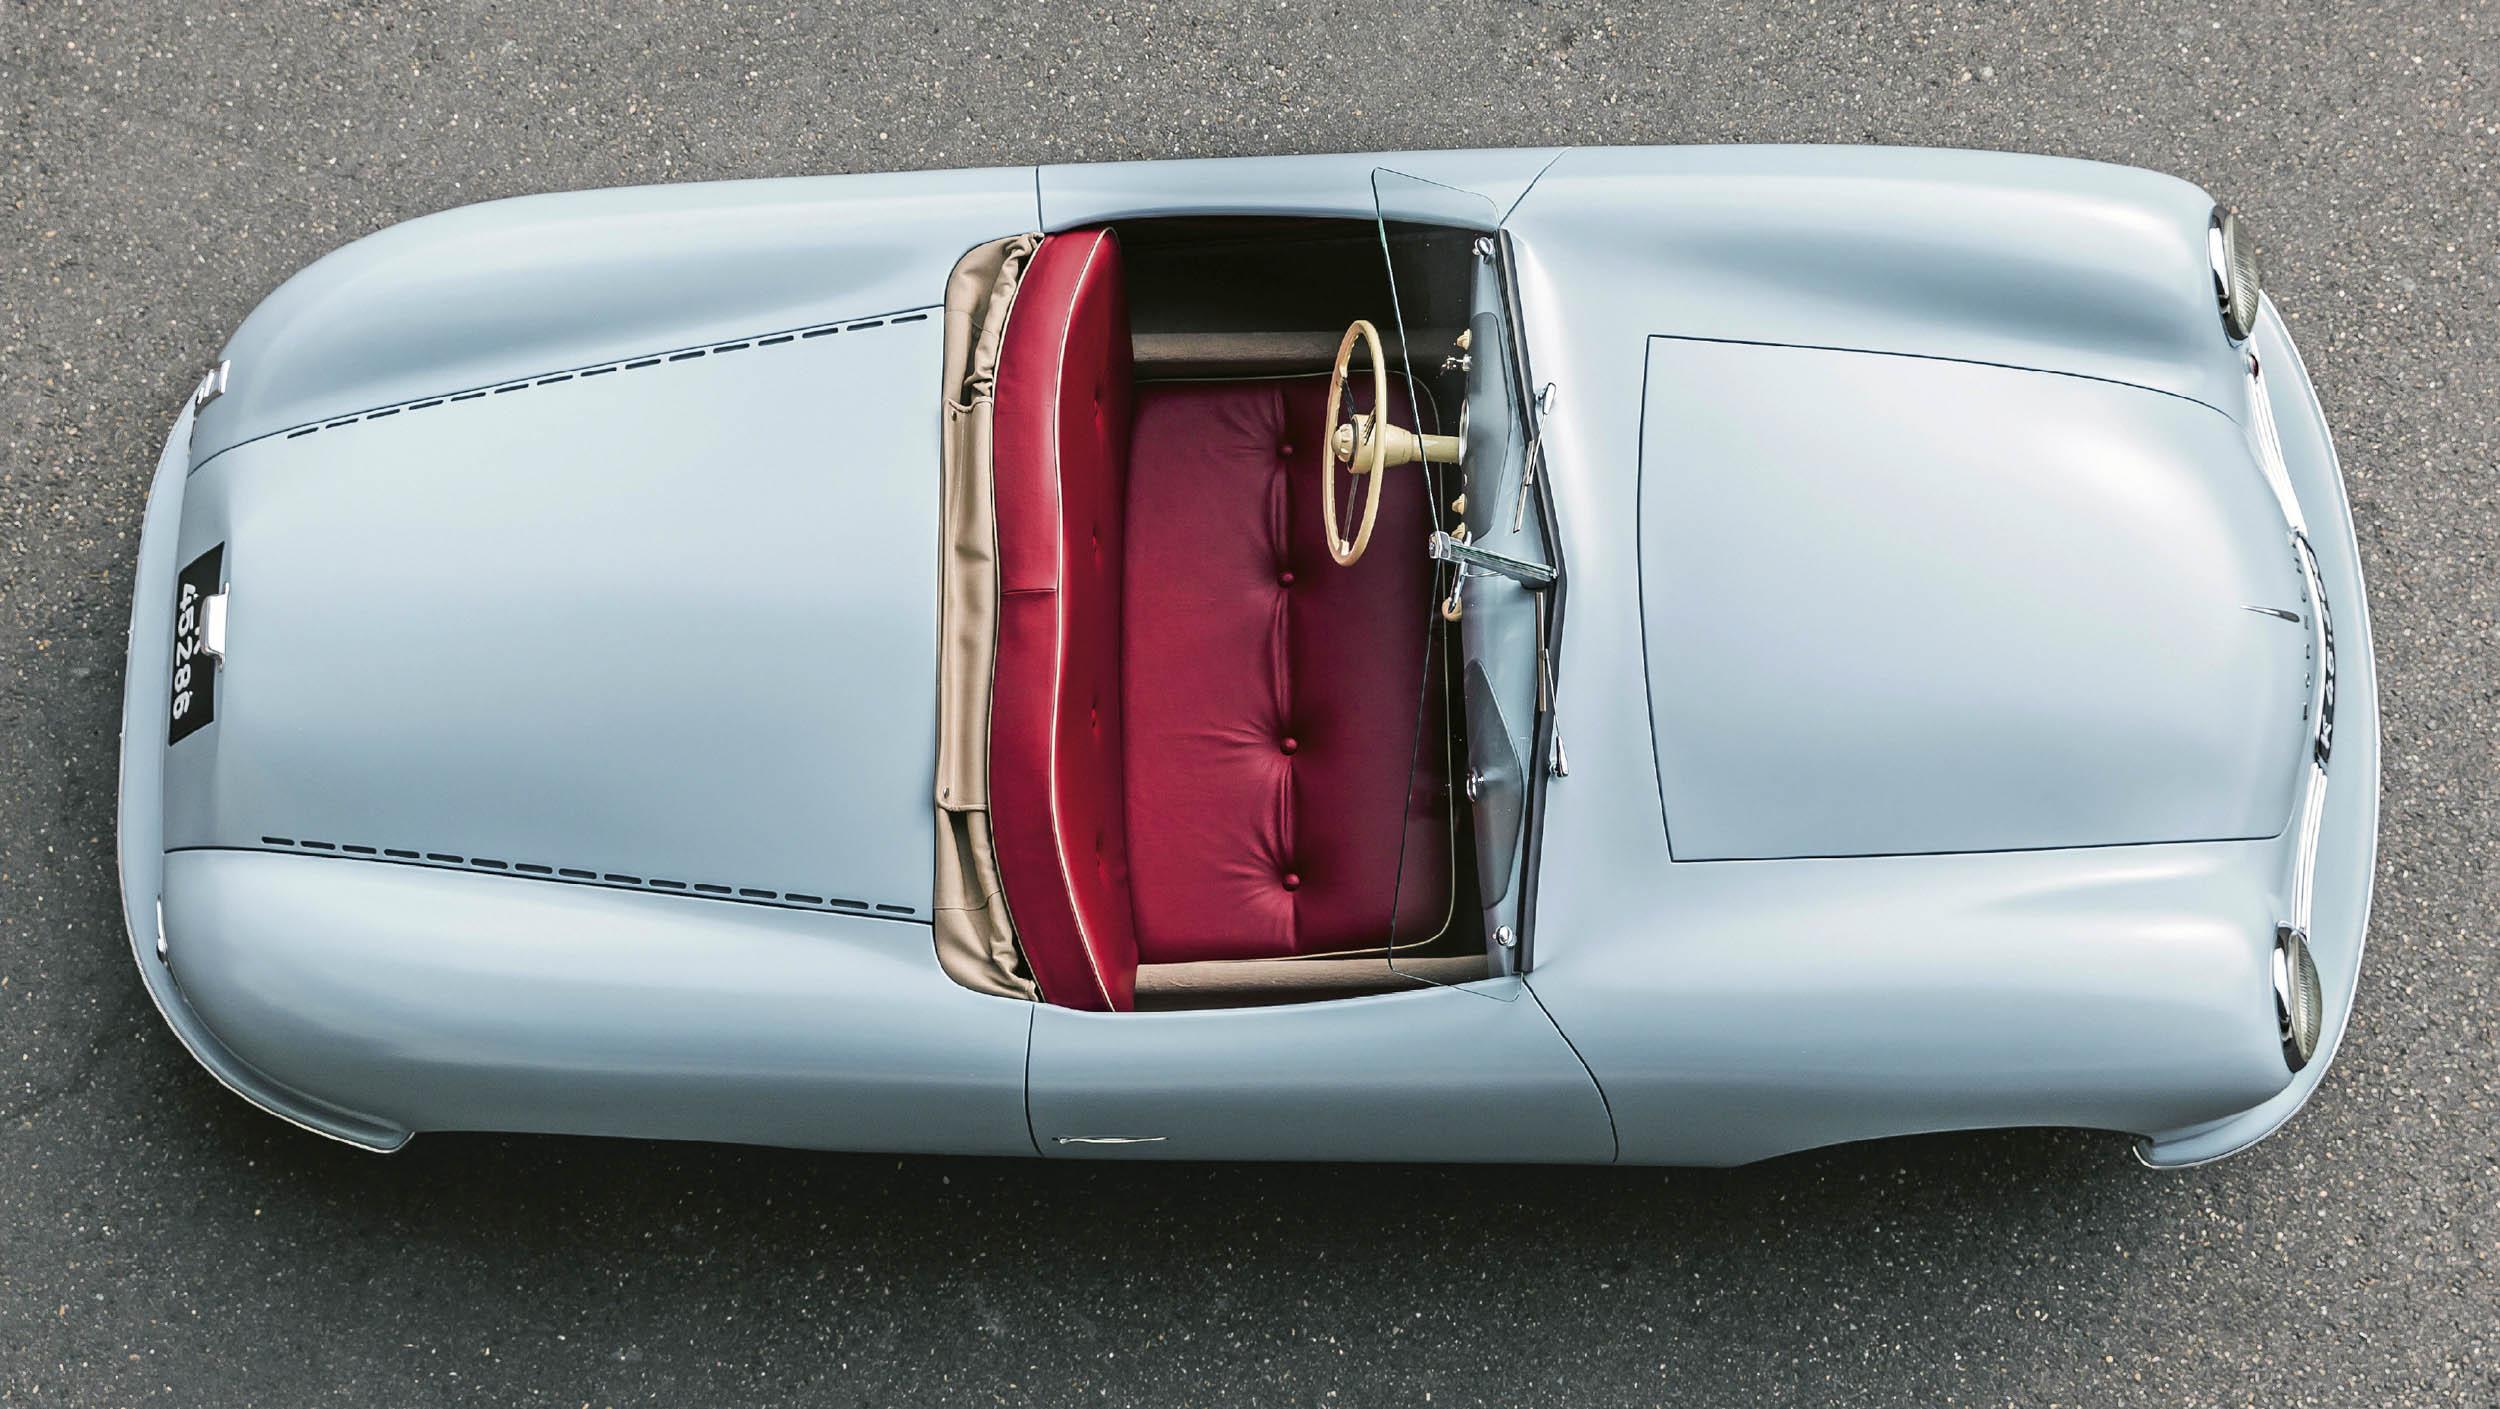 2018 Porsche 356 no. 1 replica